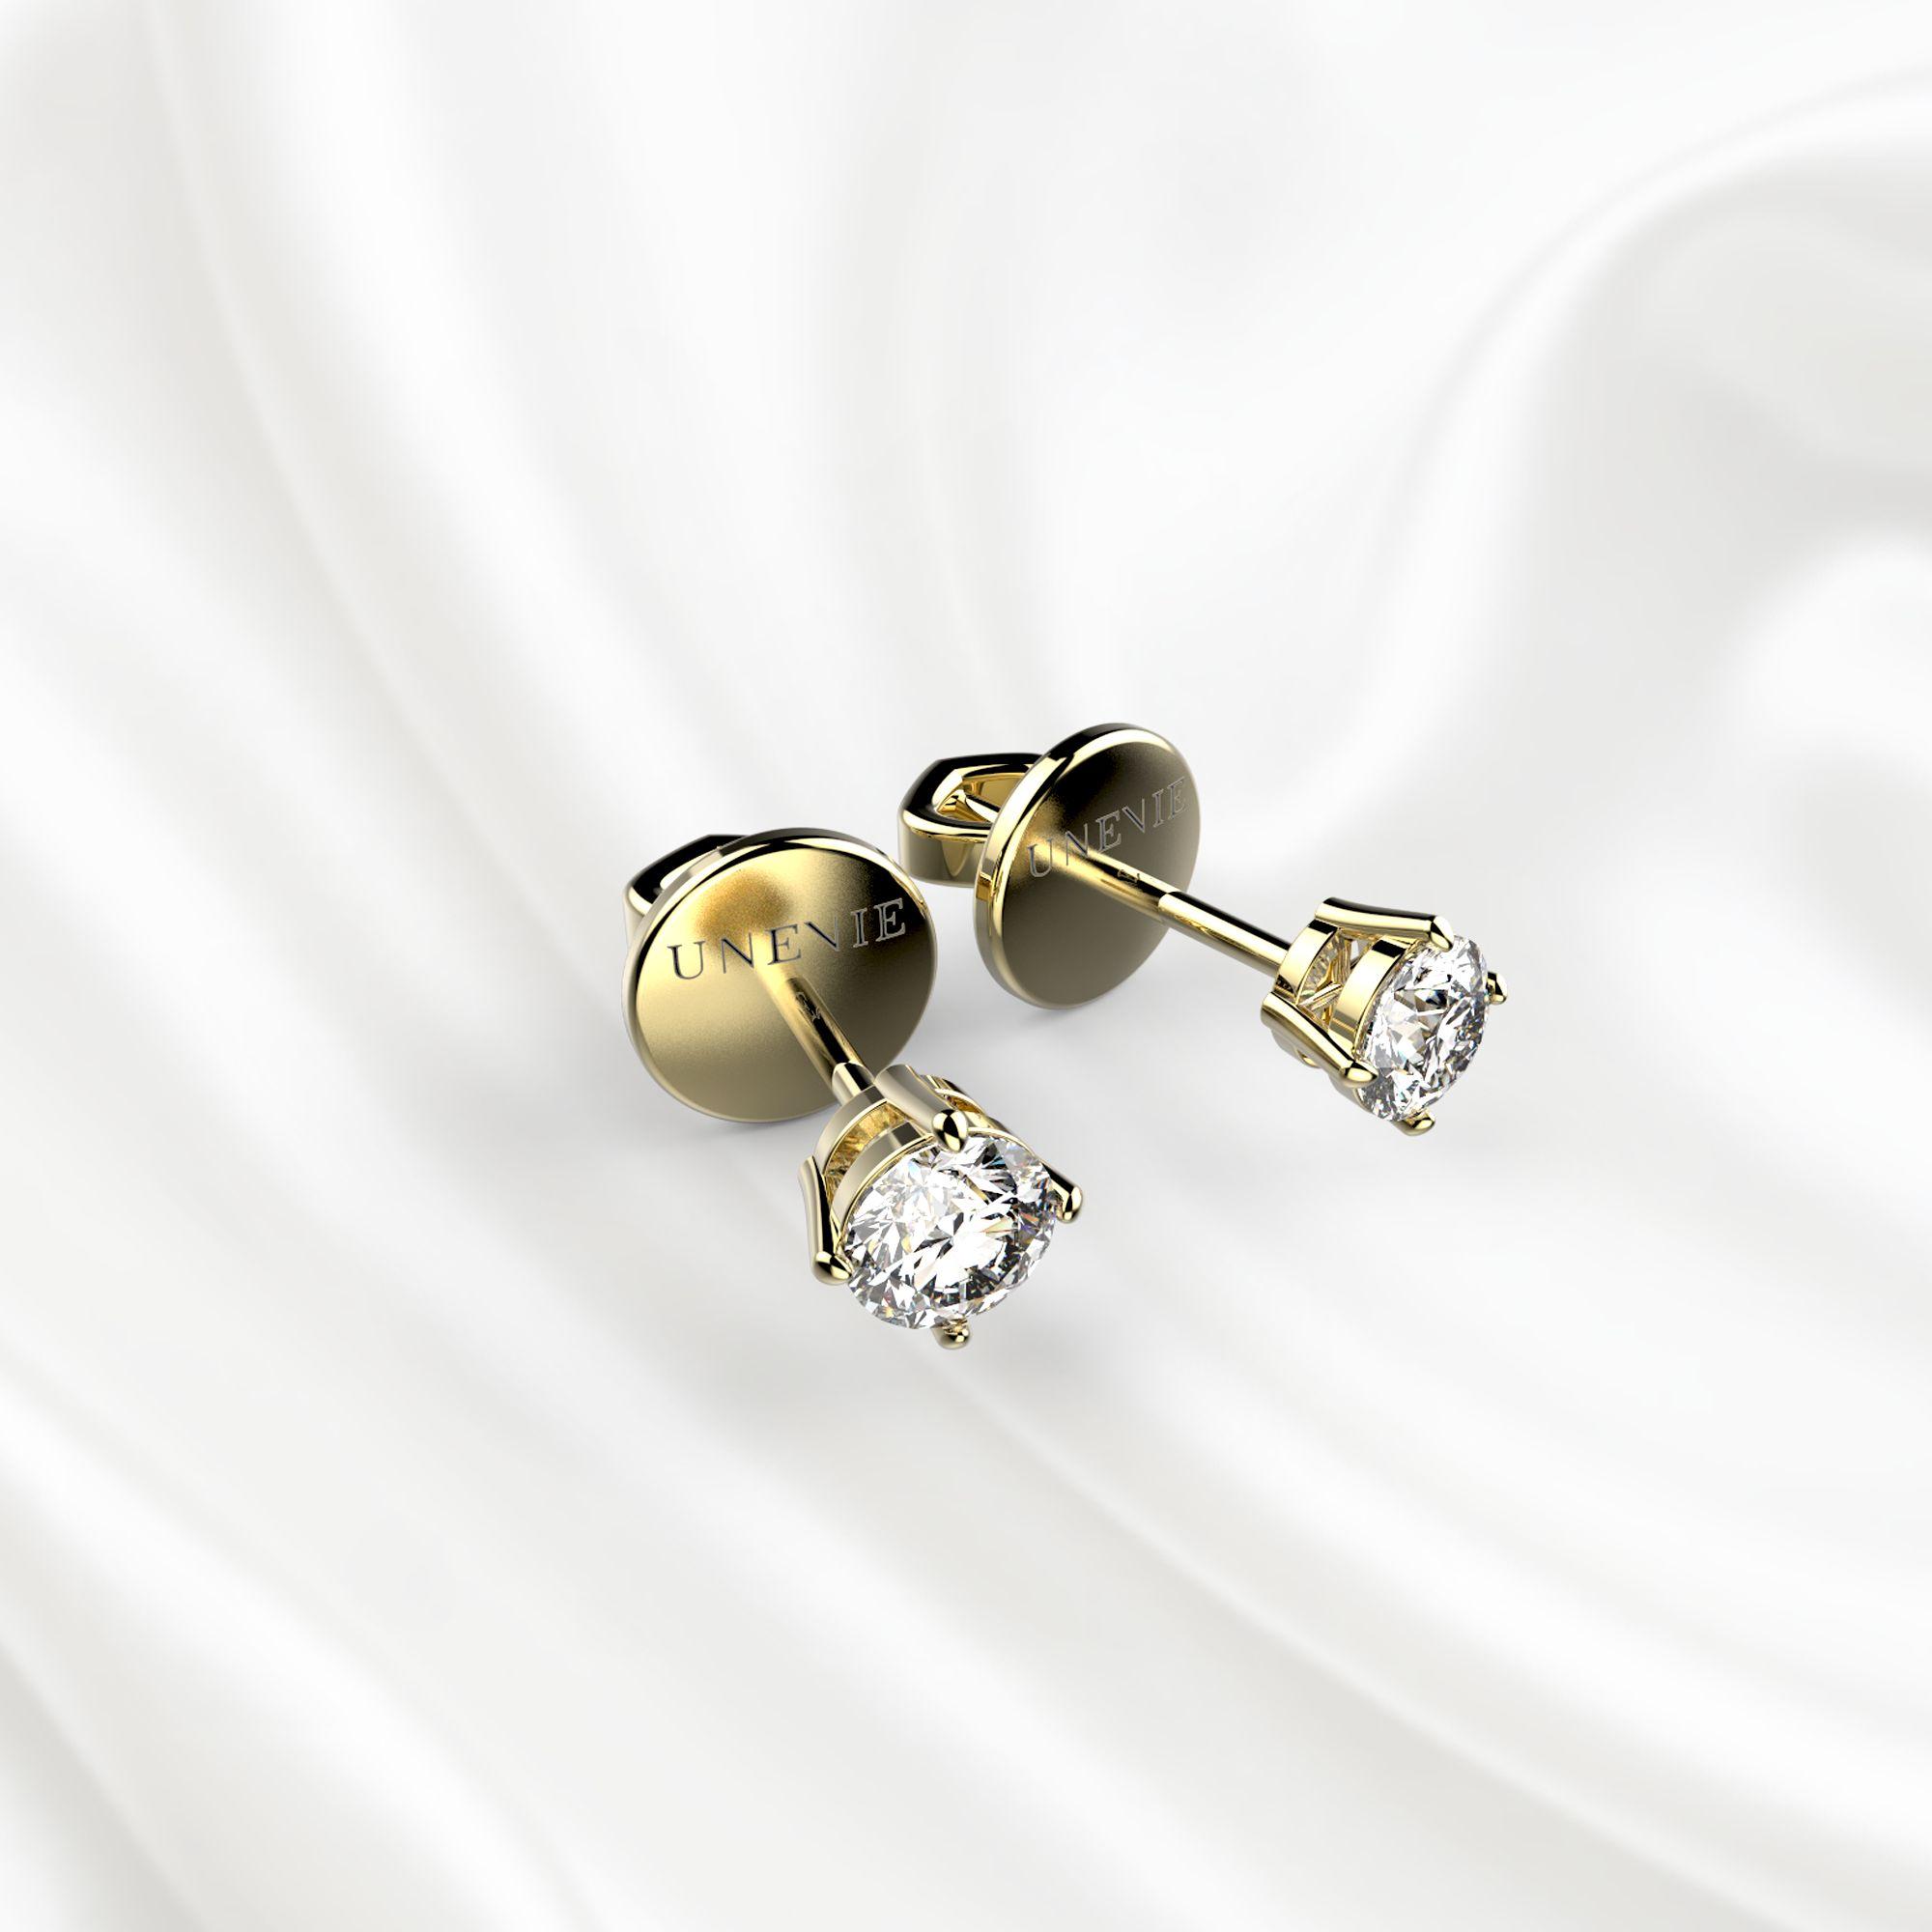 S3 Серьги из желтого золота с бриллиантами 0,2 карат